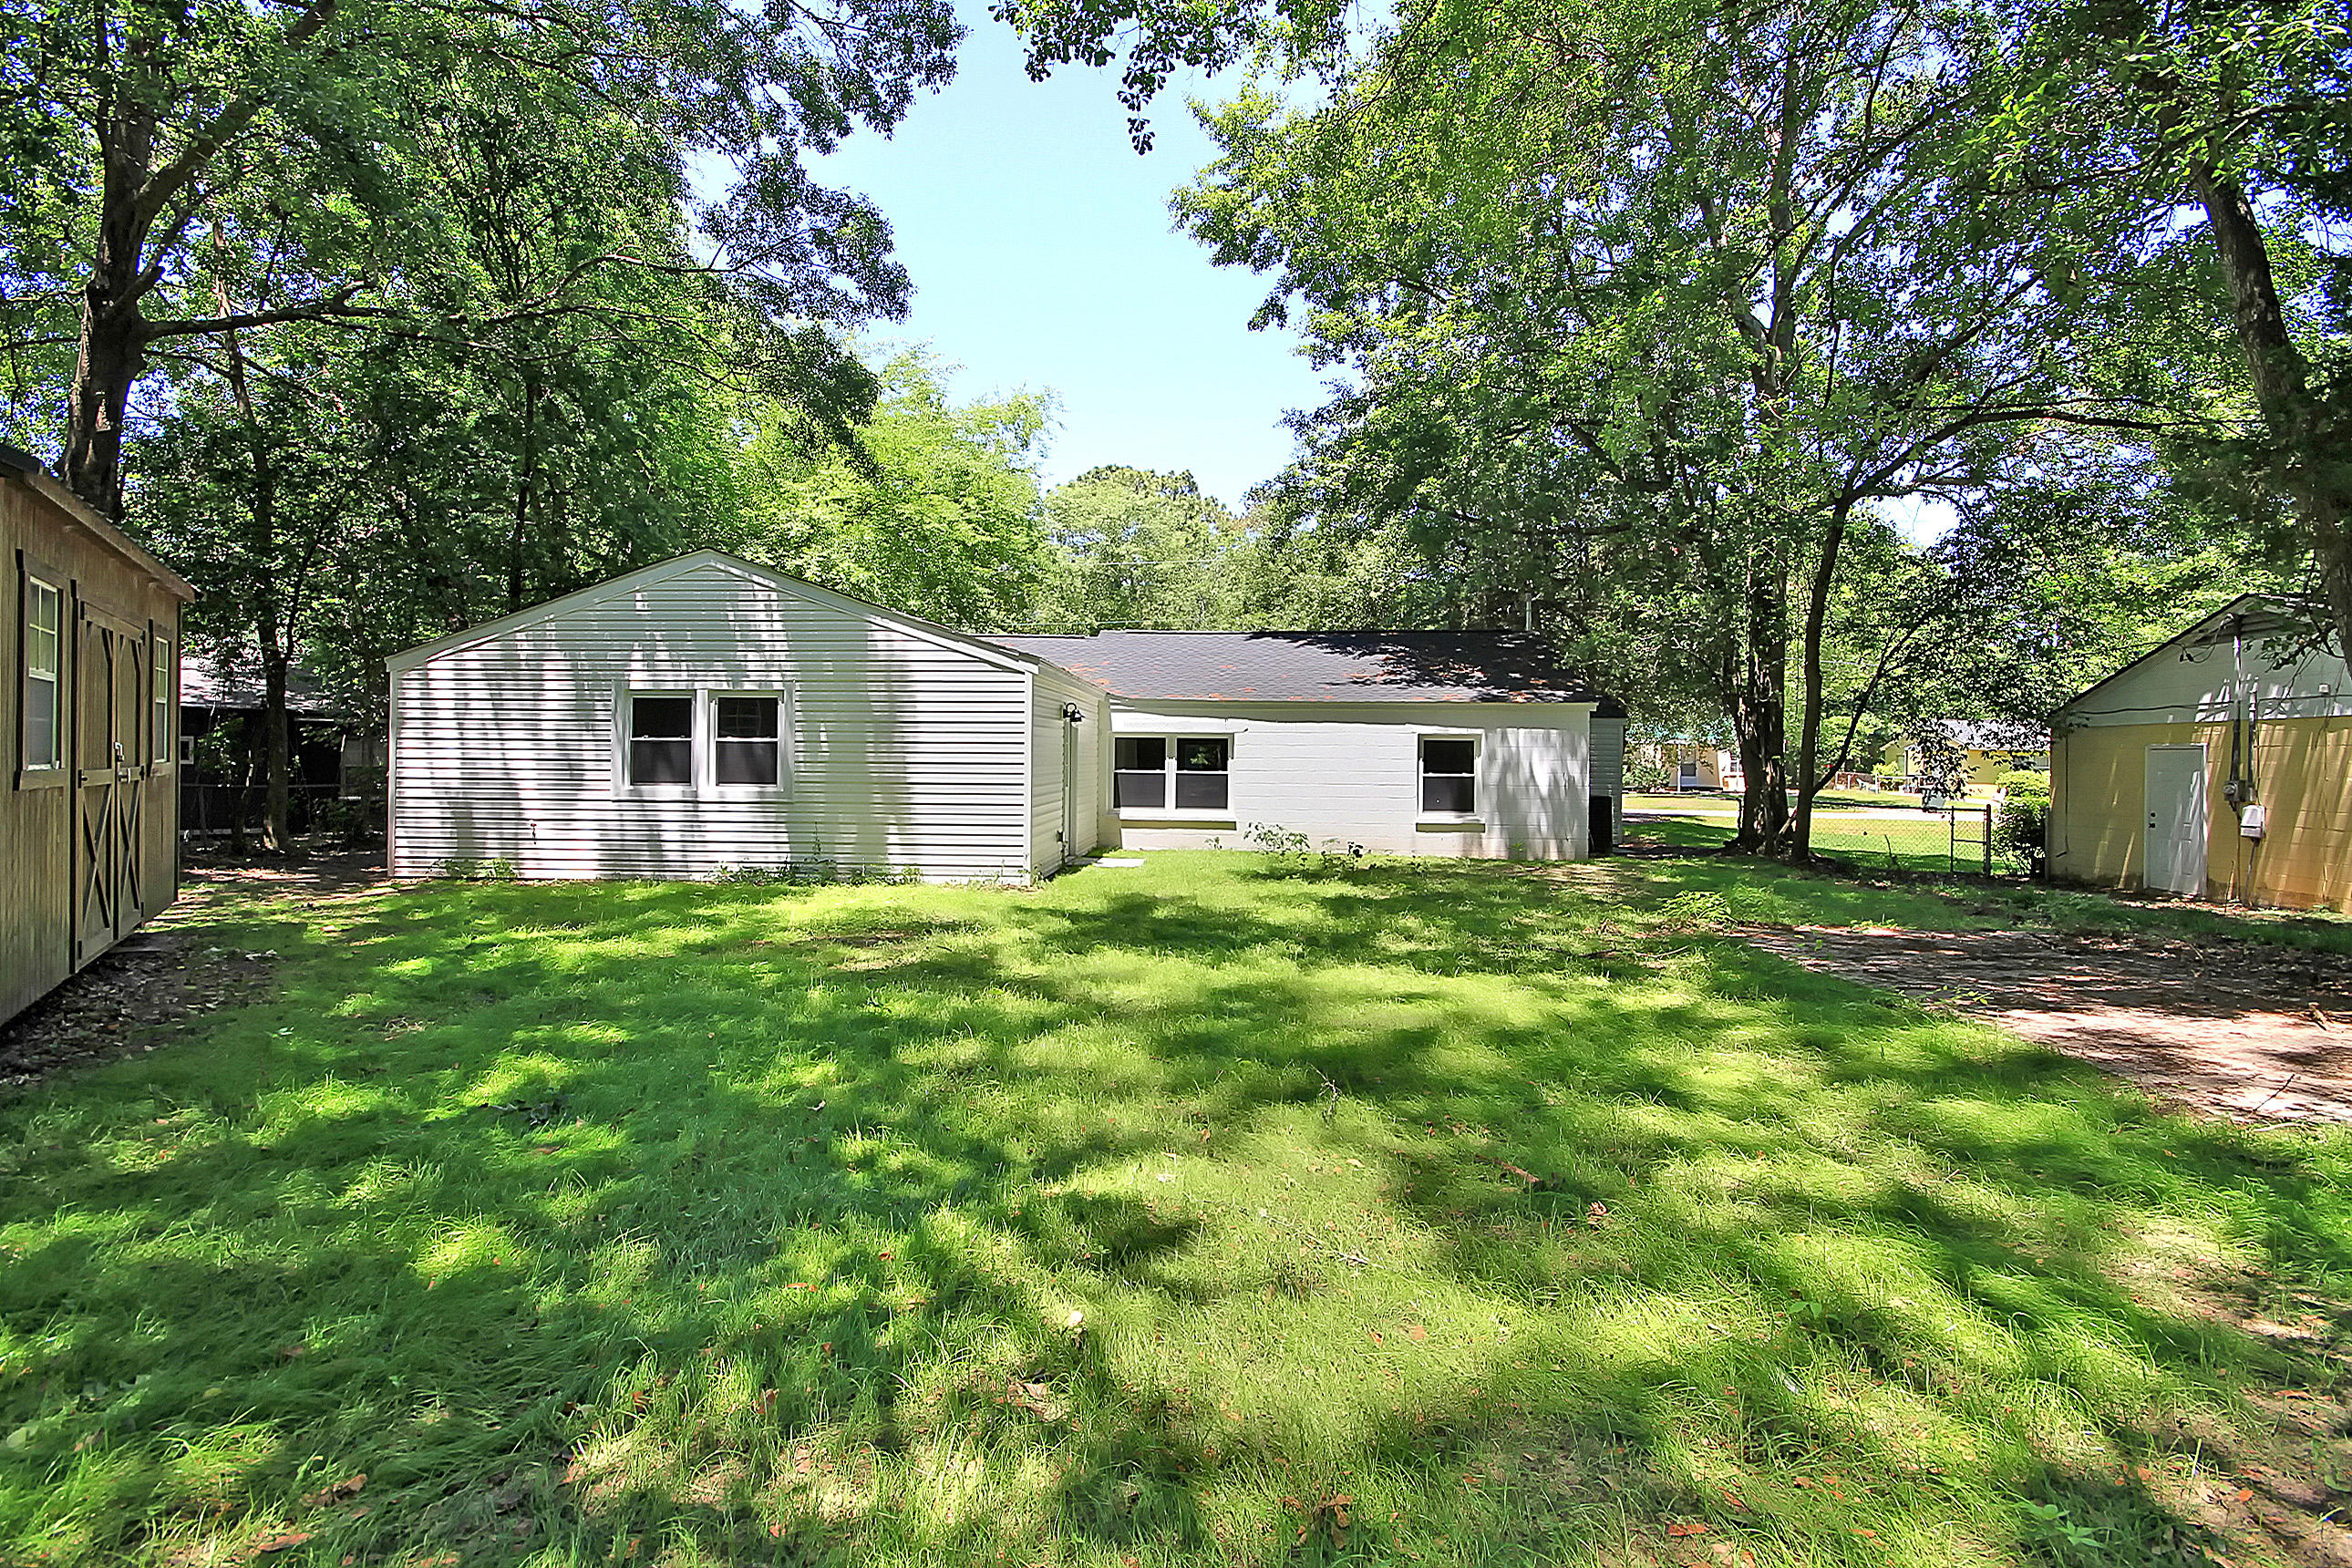 Yeamans Park Homes For Sale - 1207 Jones, Hanahan, SC - 23